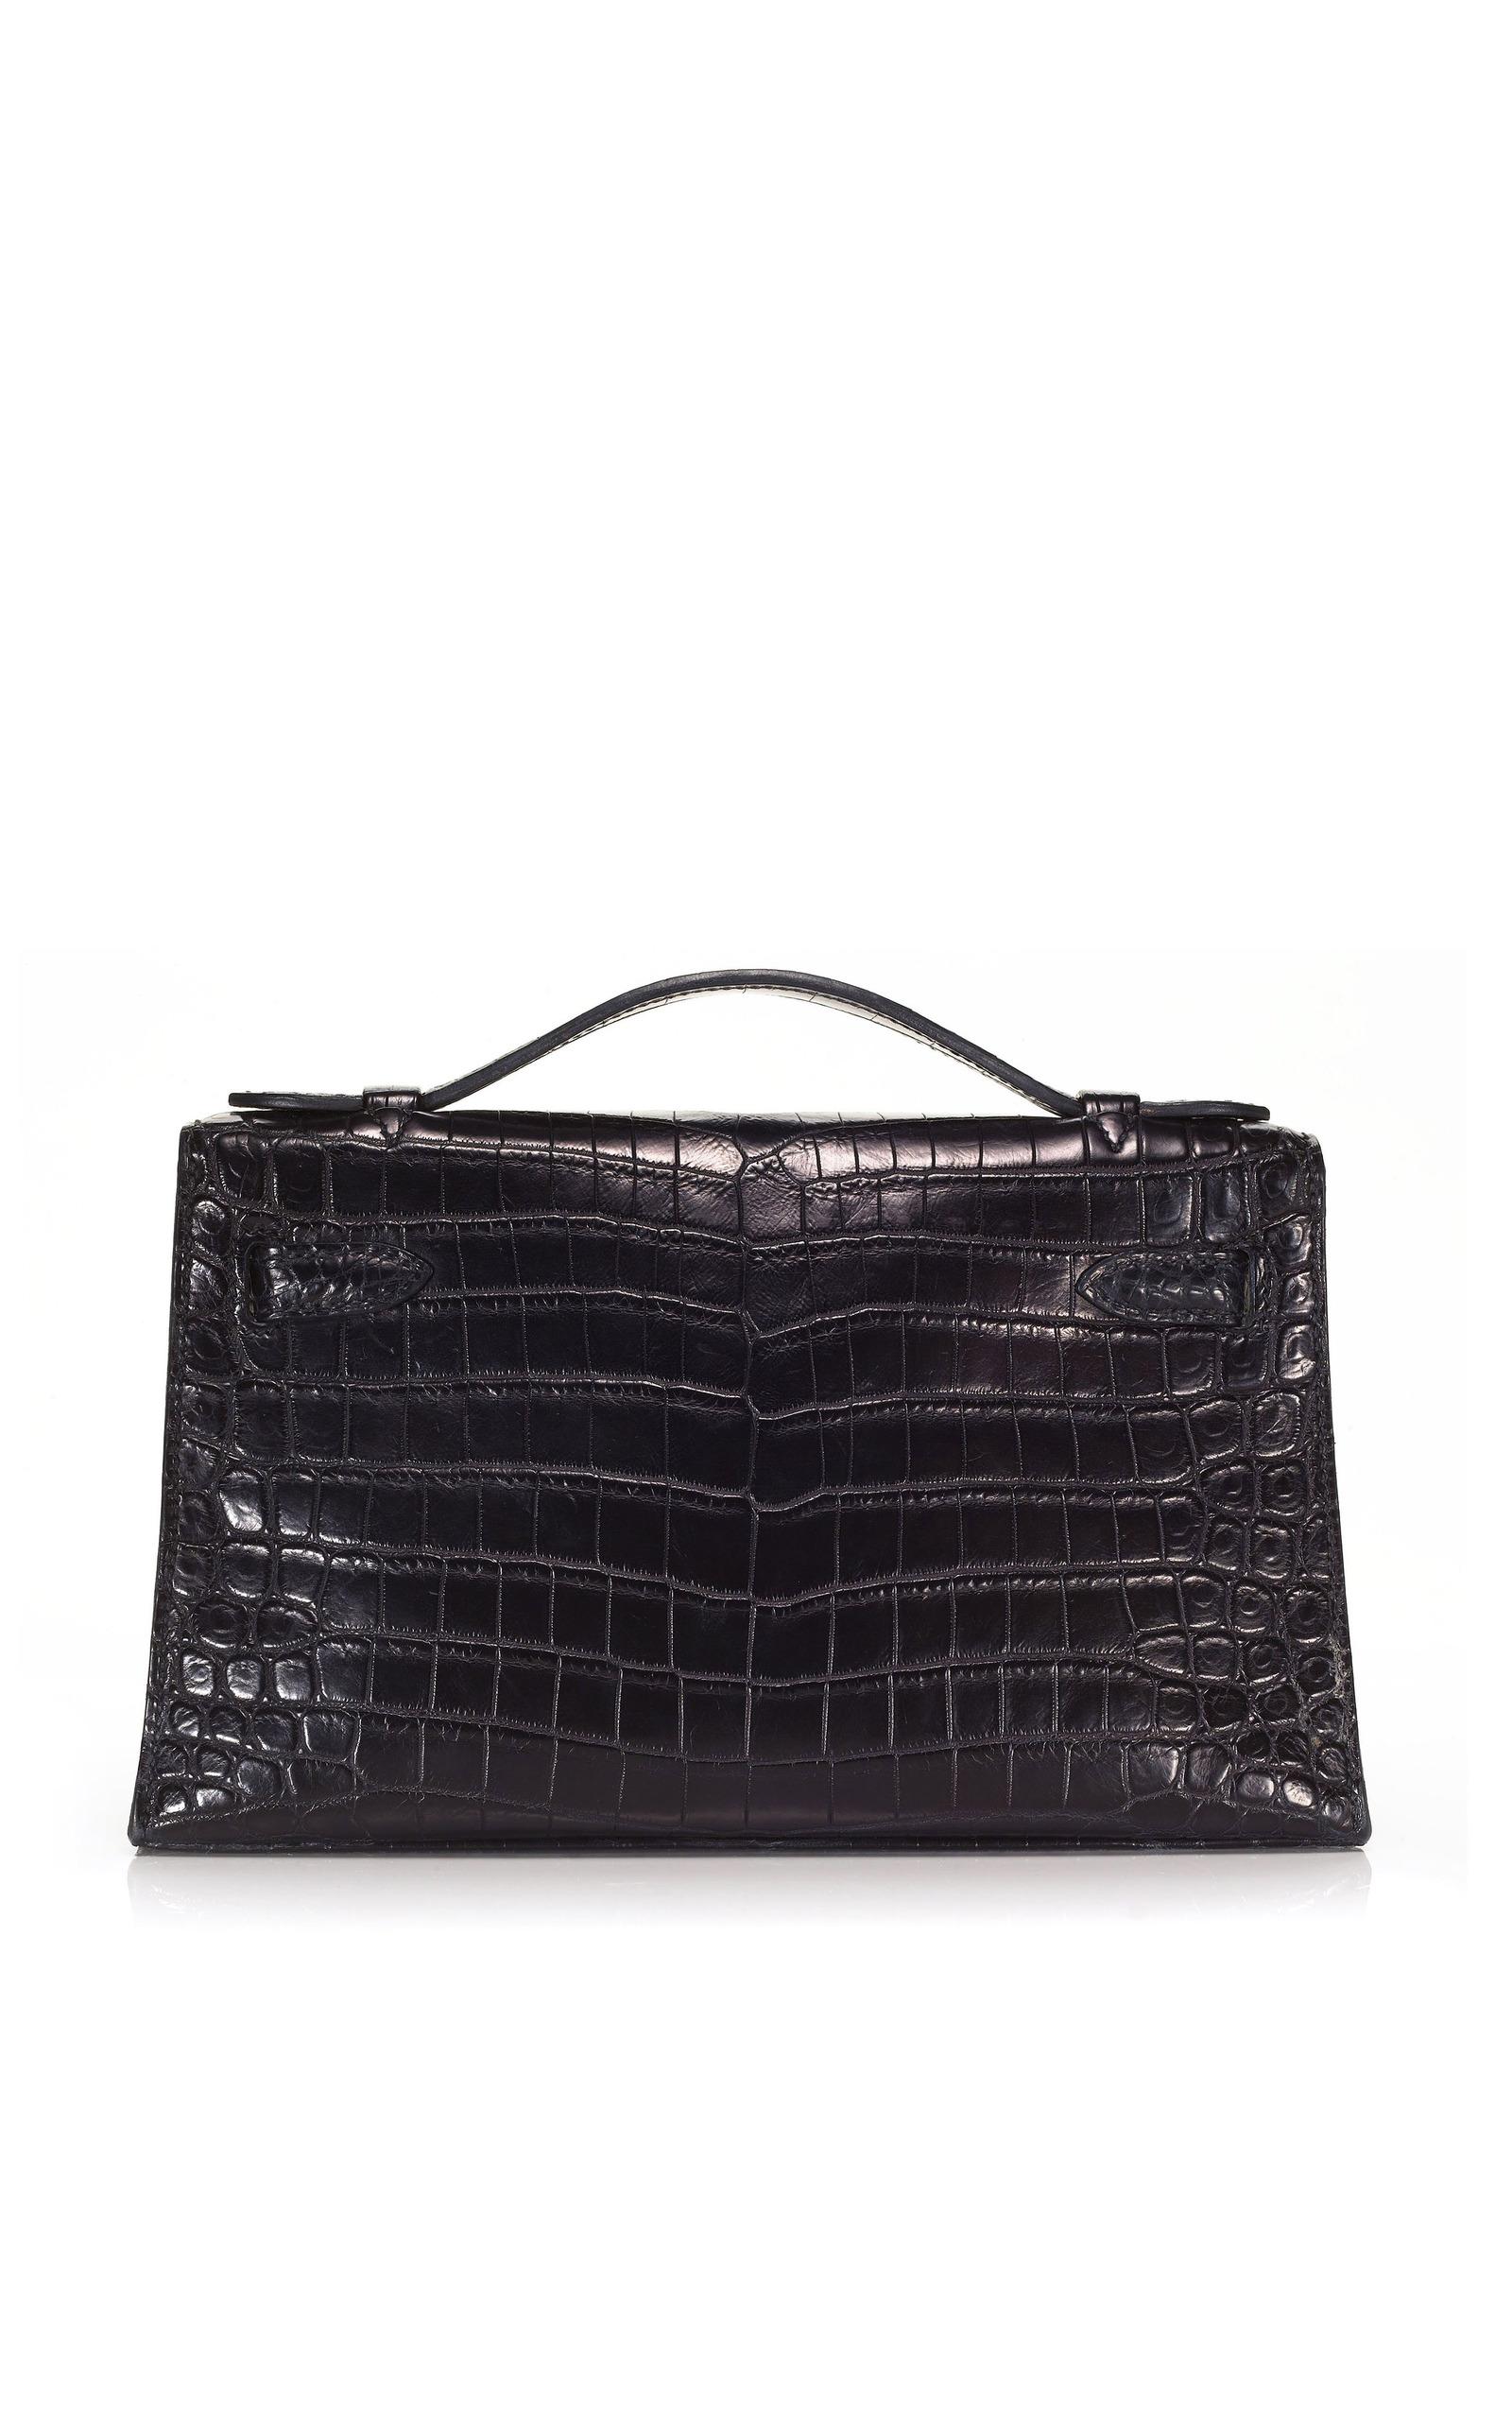 262391e998d1 ... france black matte nilo crocodile kelly pochette by hermès moda  operandi d4877 c536e ...